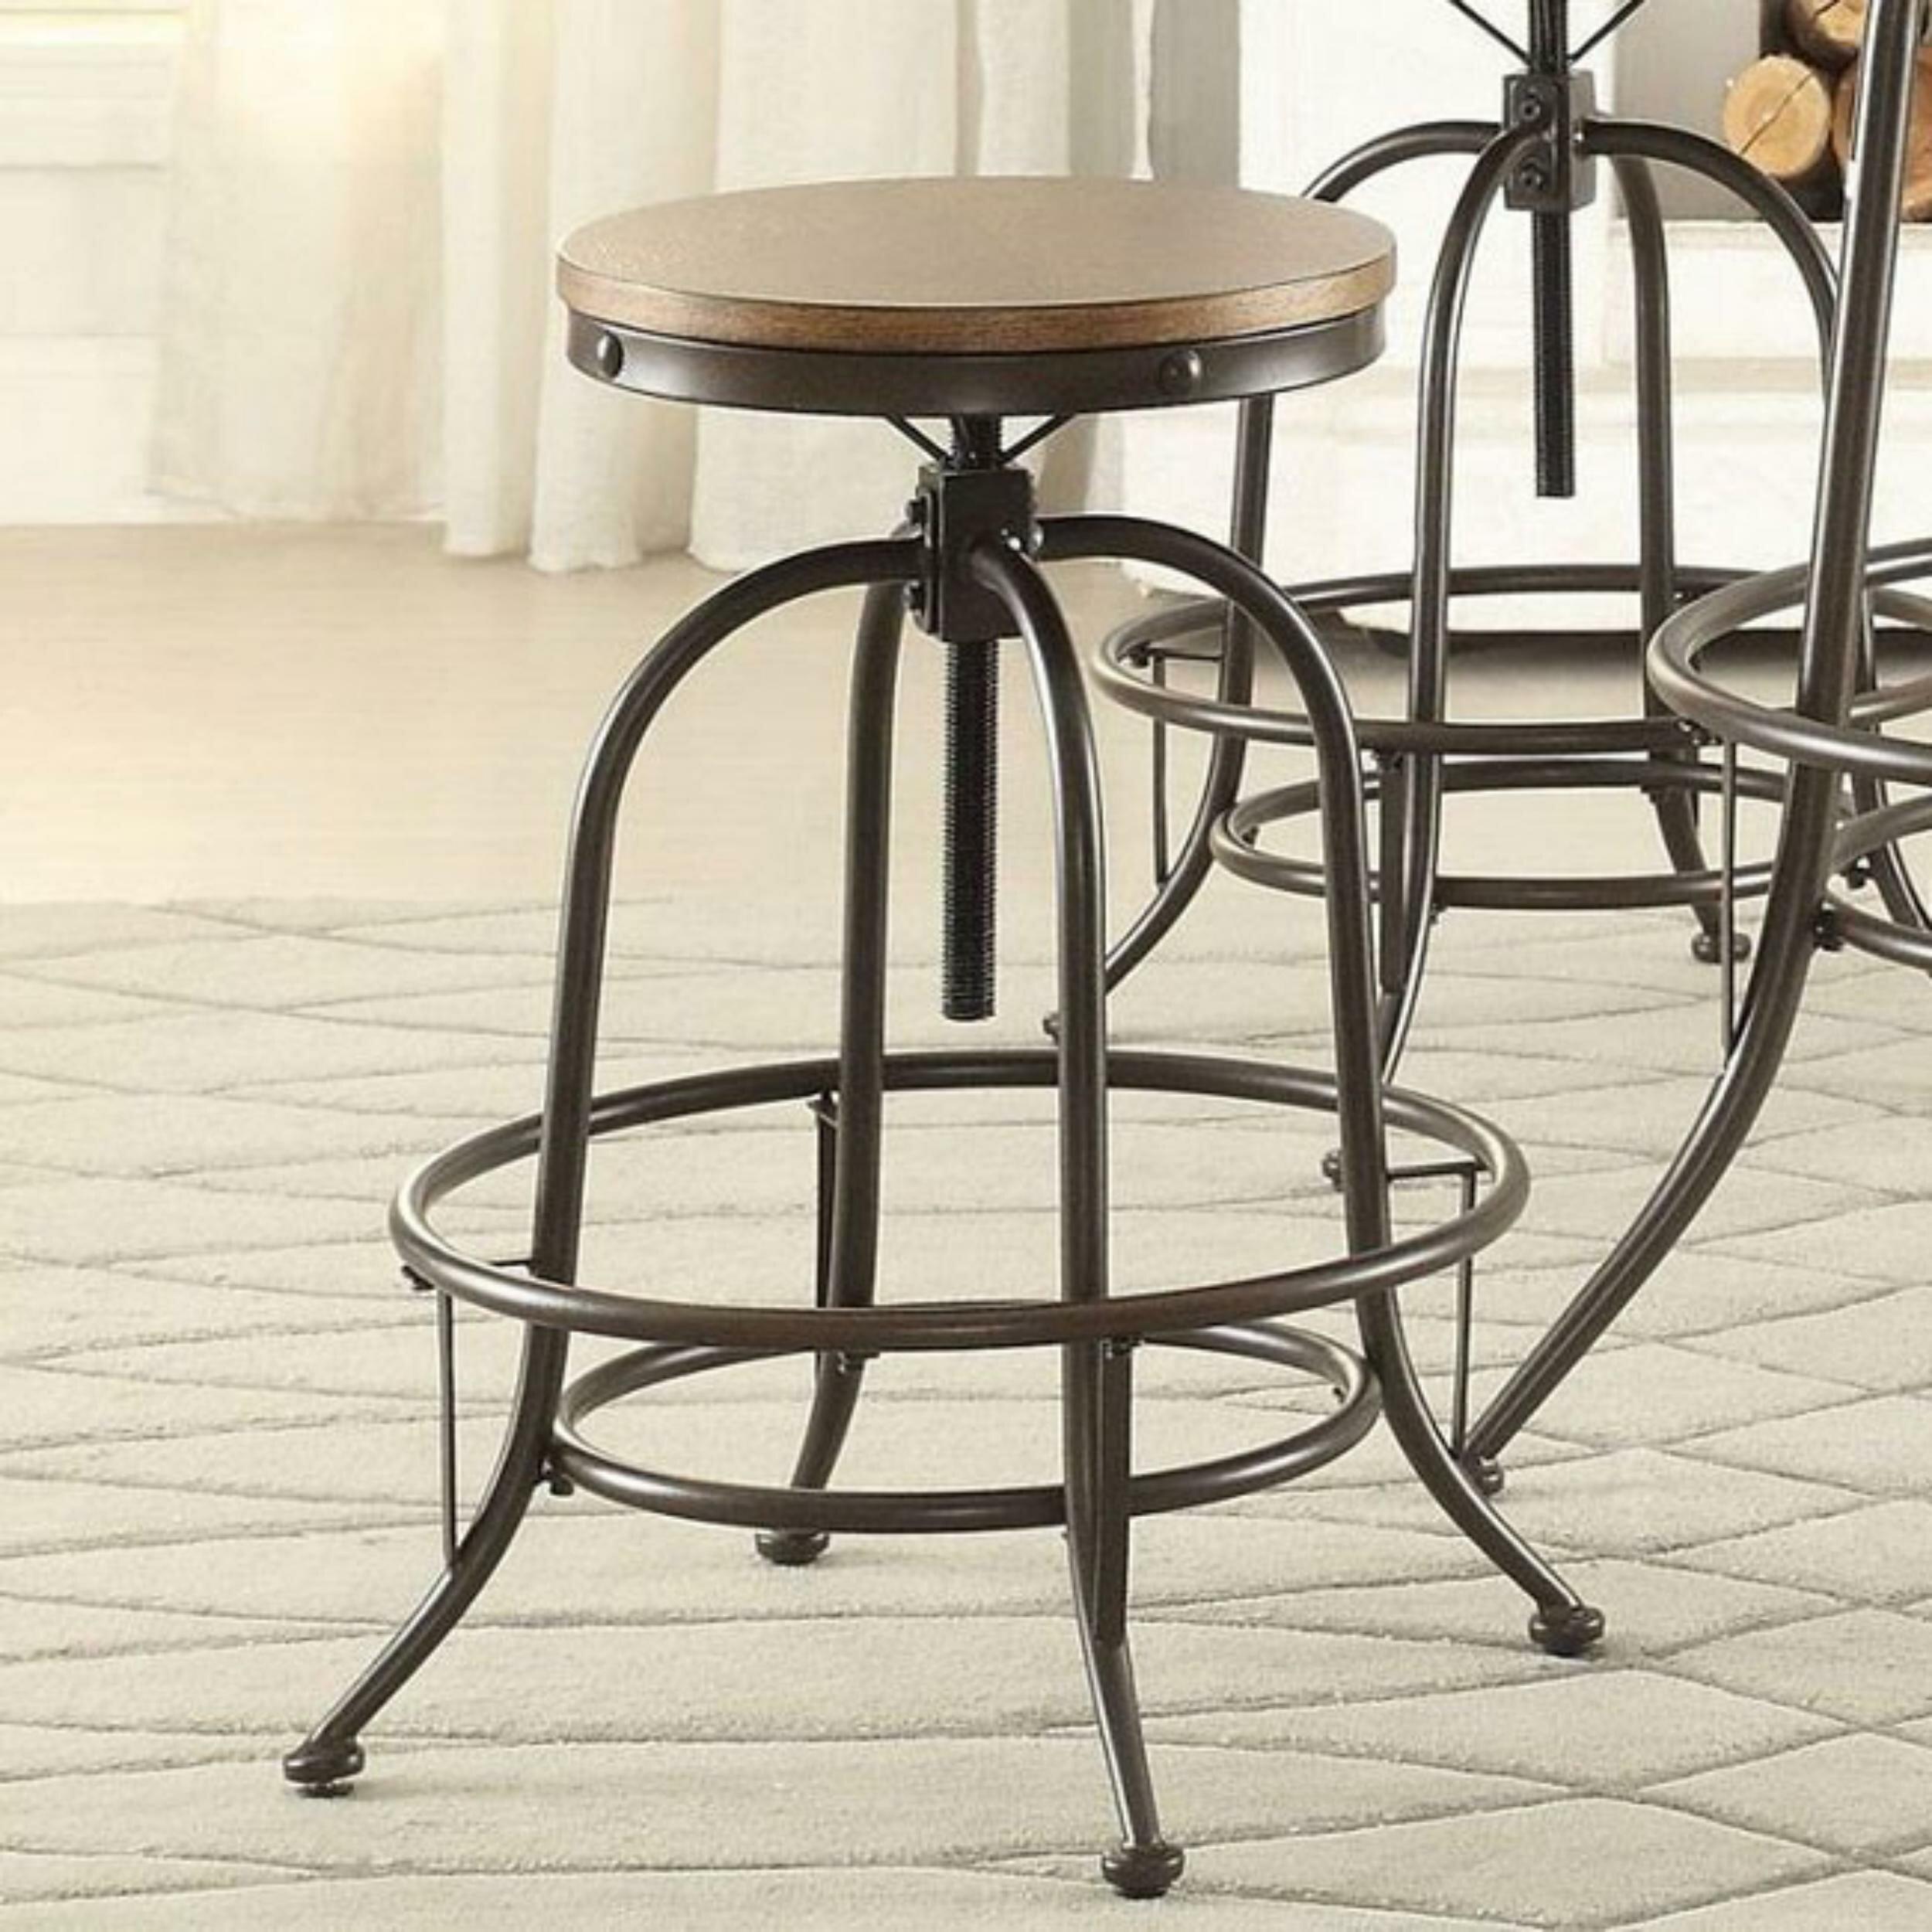 Brilliant Wynona Wood Metal Backless Adjustable Height Swivel Bar Stool Creativecarmelina Interior Chair Design Creativecarmelinacom